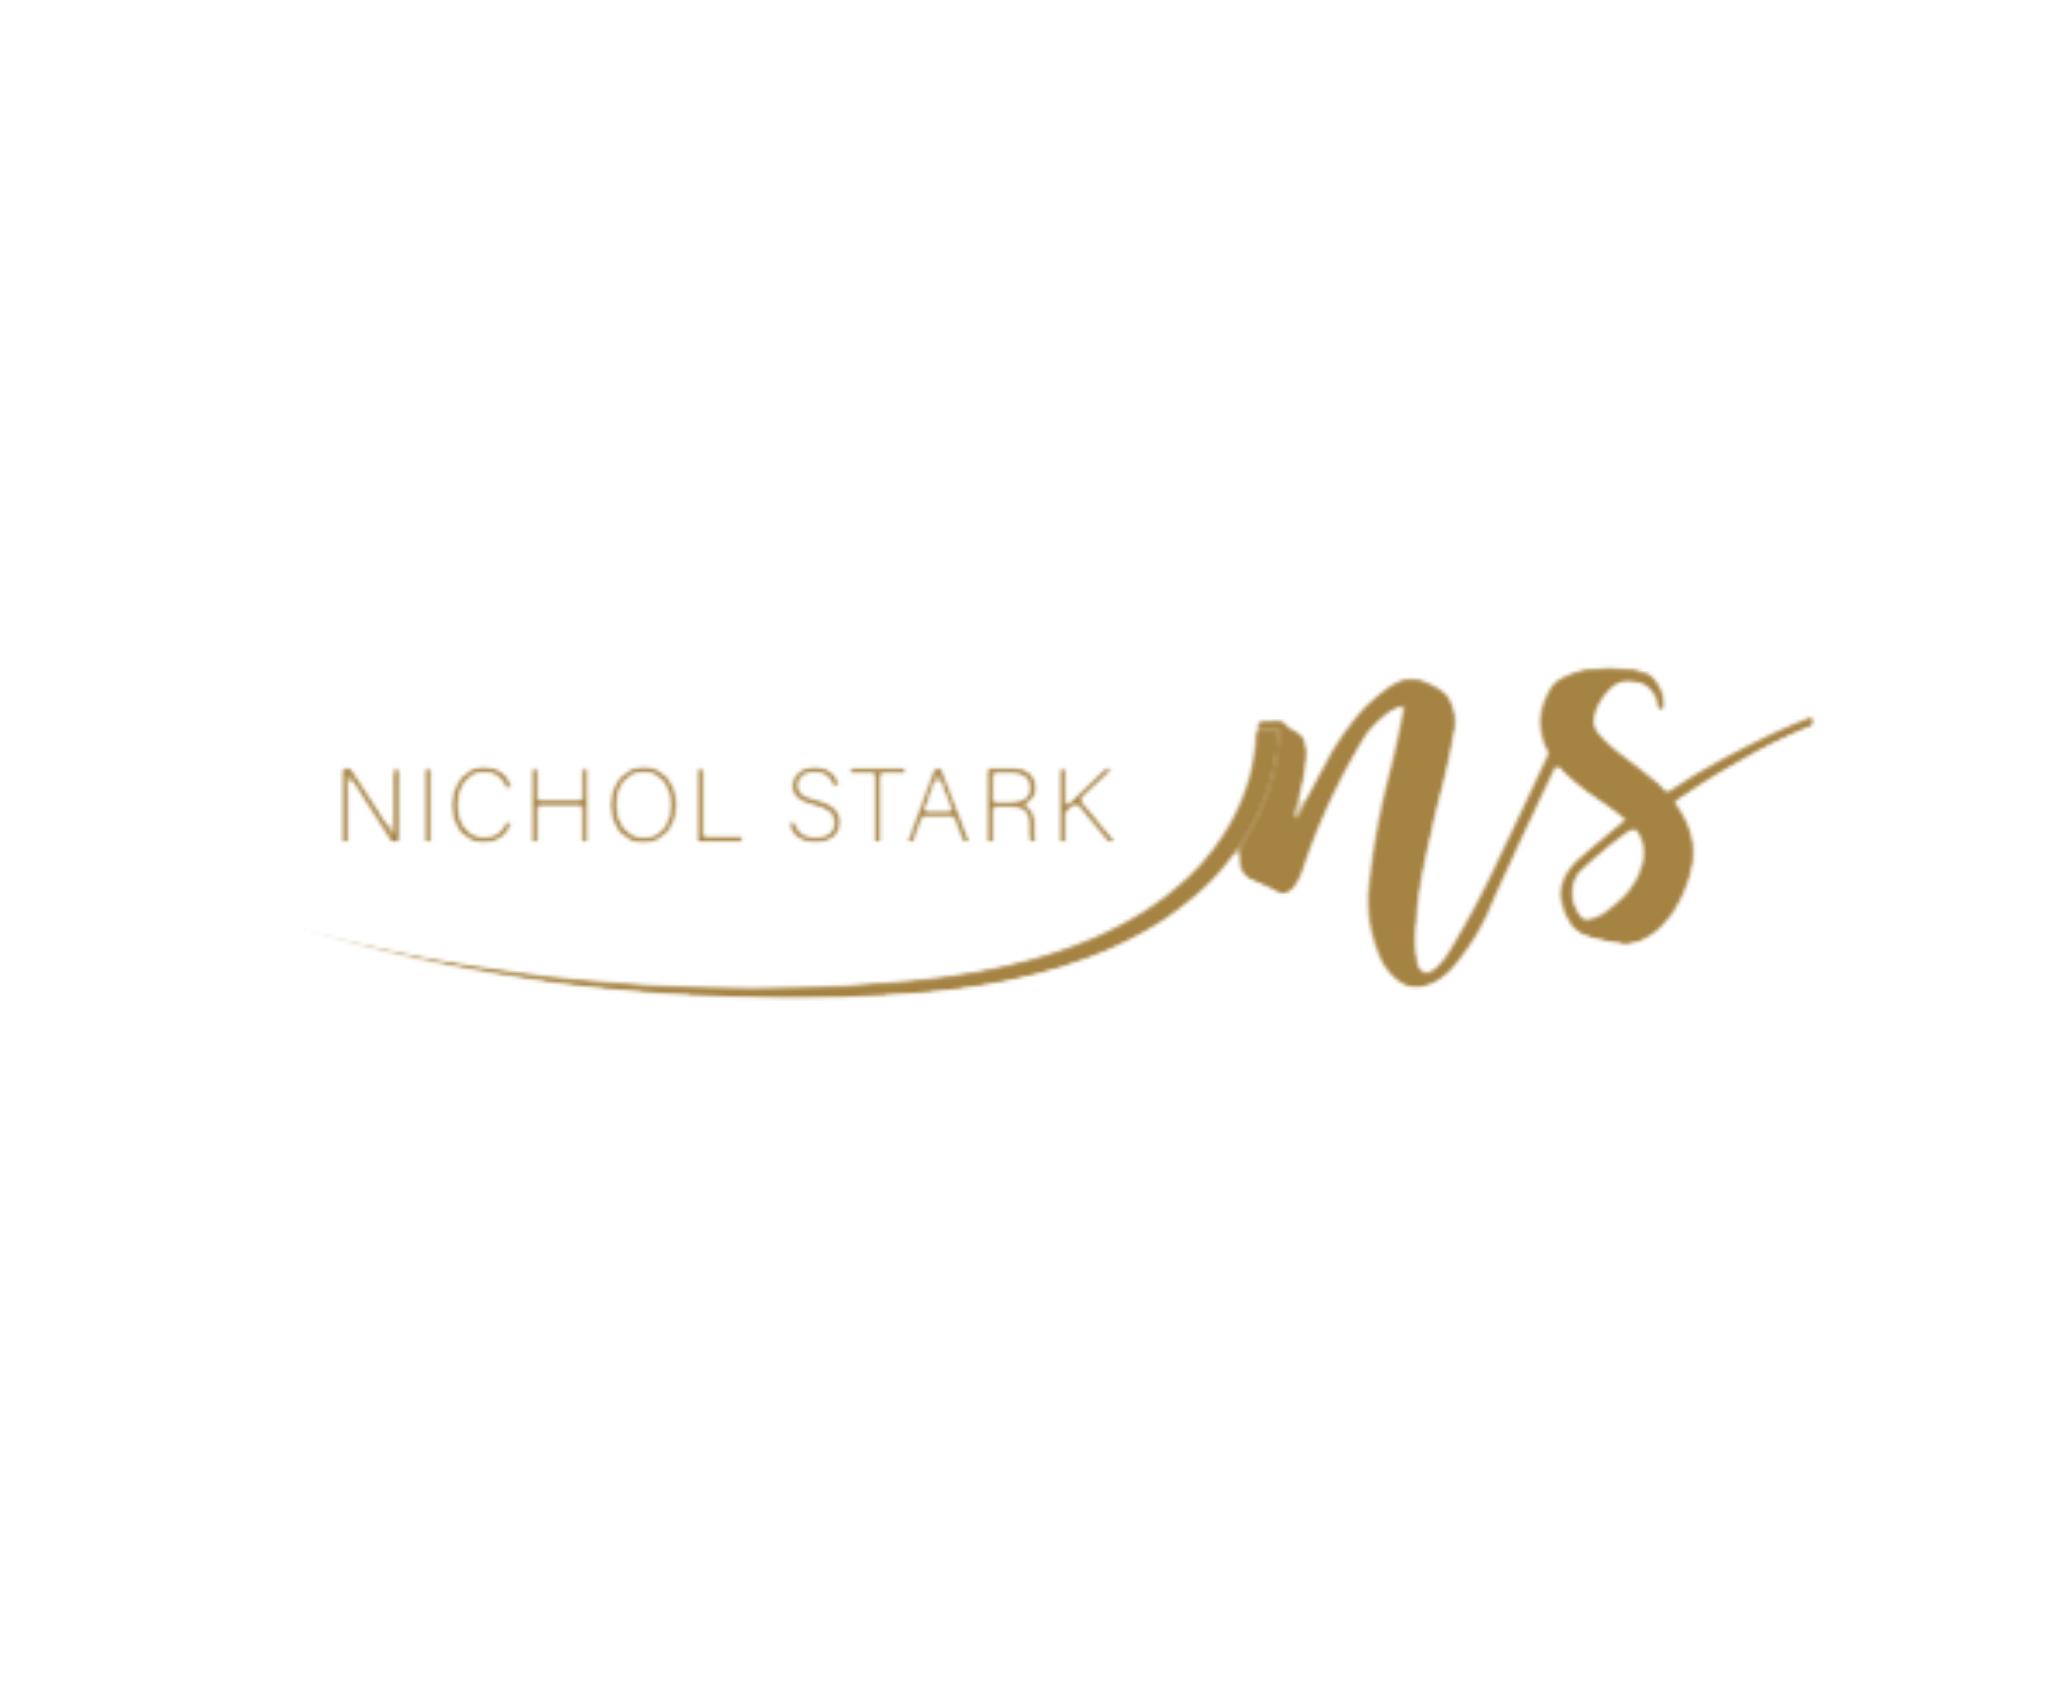 personal brand logo Nichol Stark